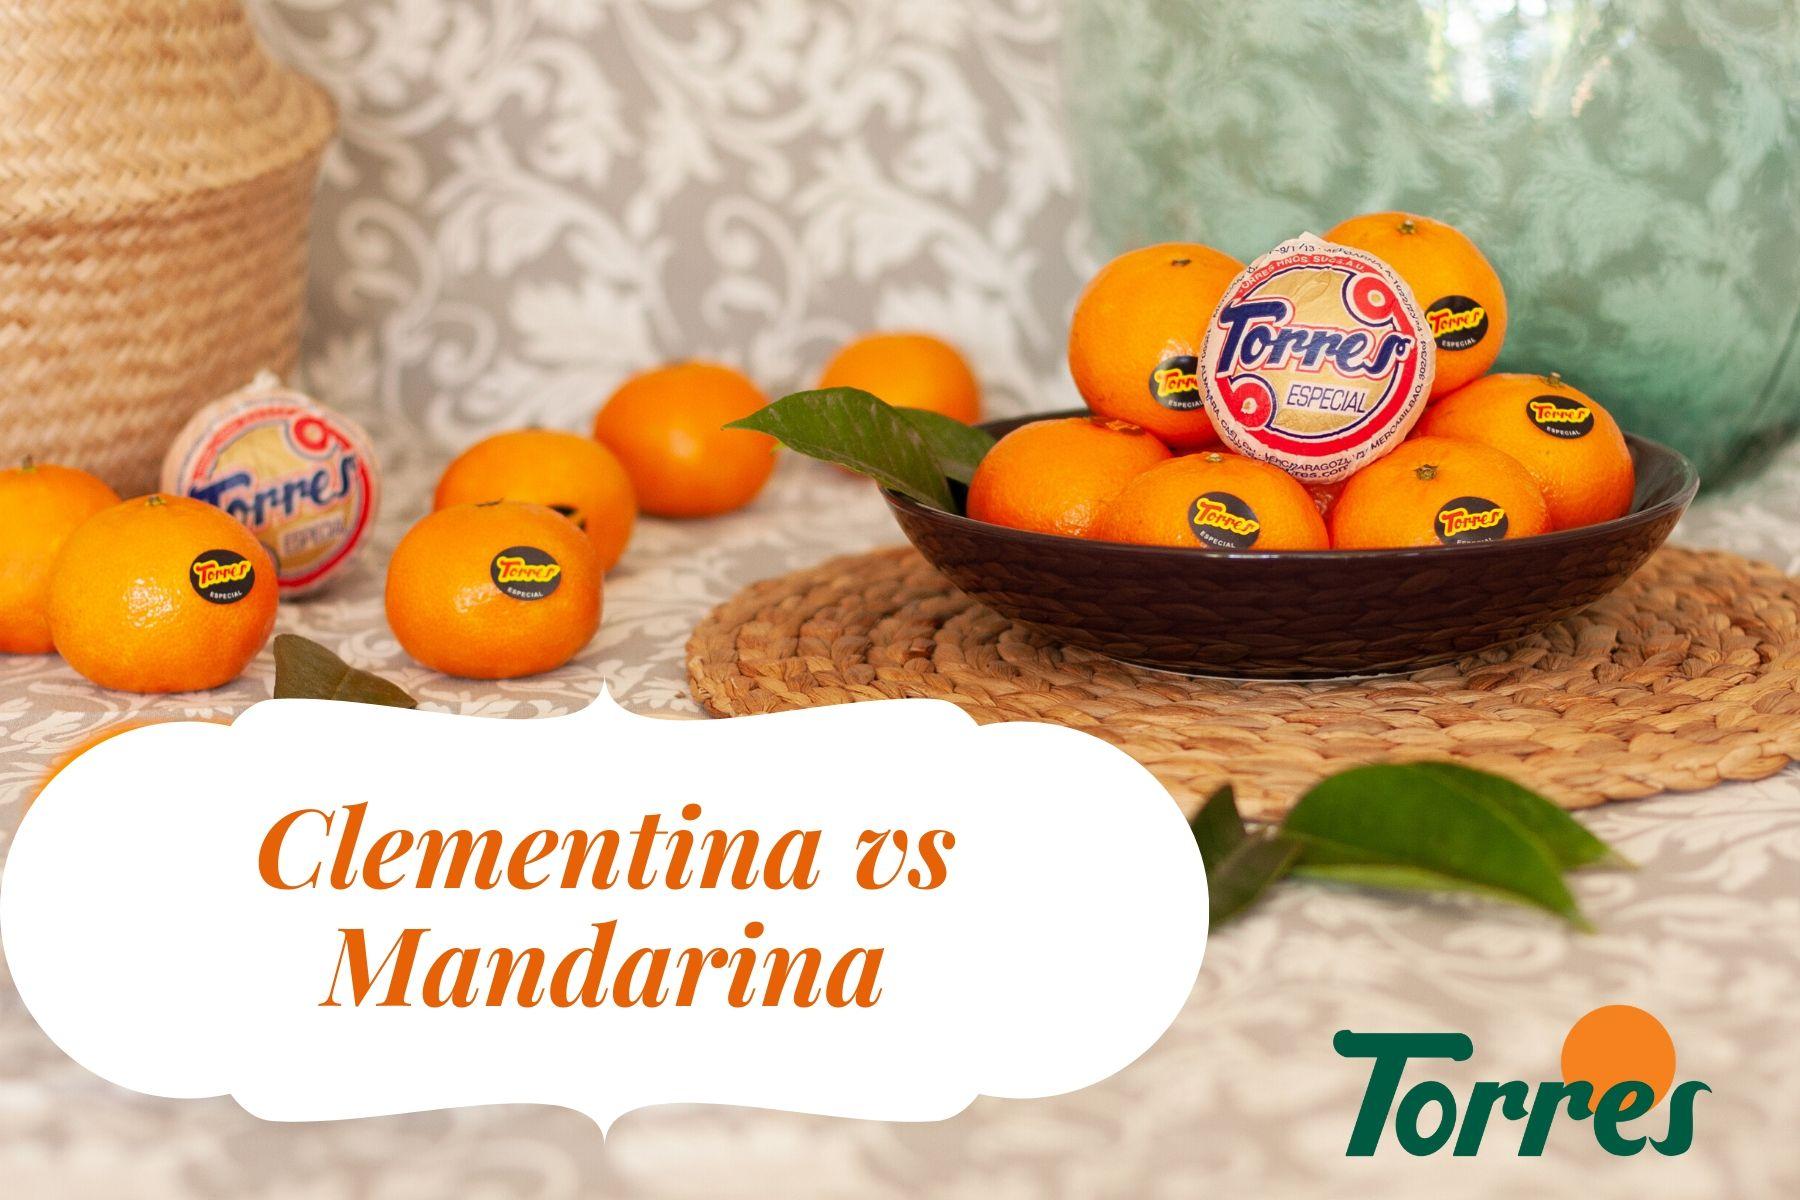 clementina vs mandarina